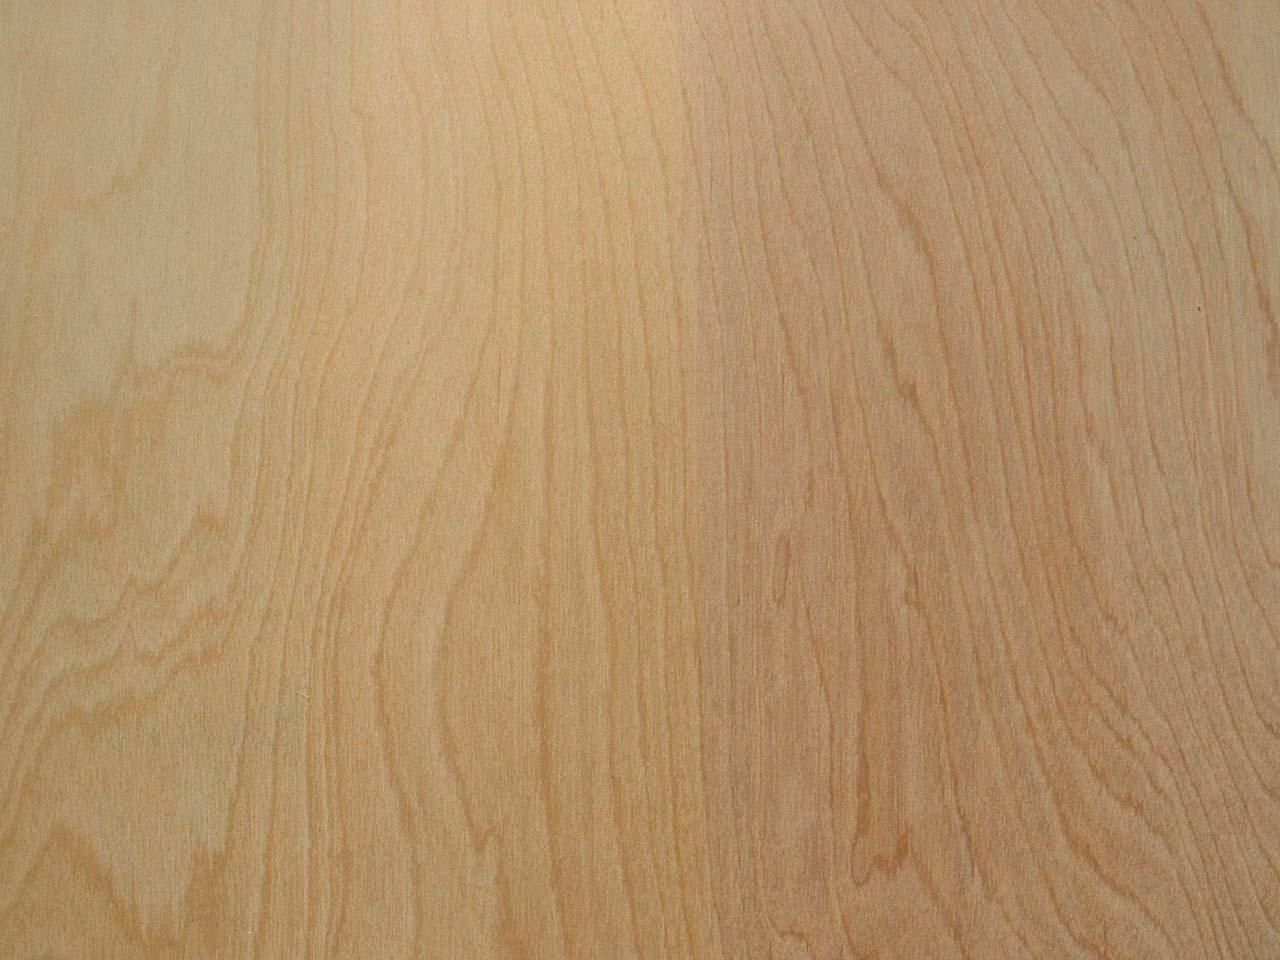 Poplar Vs Birch Lumber